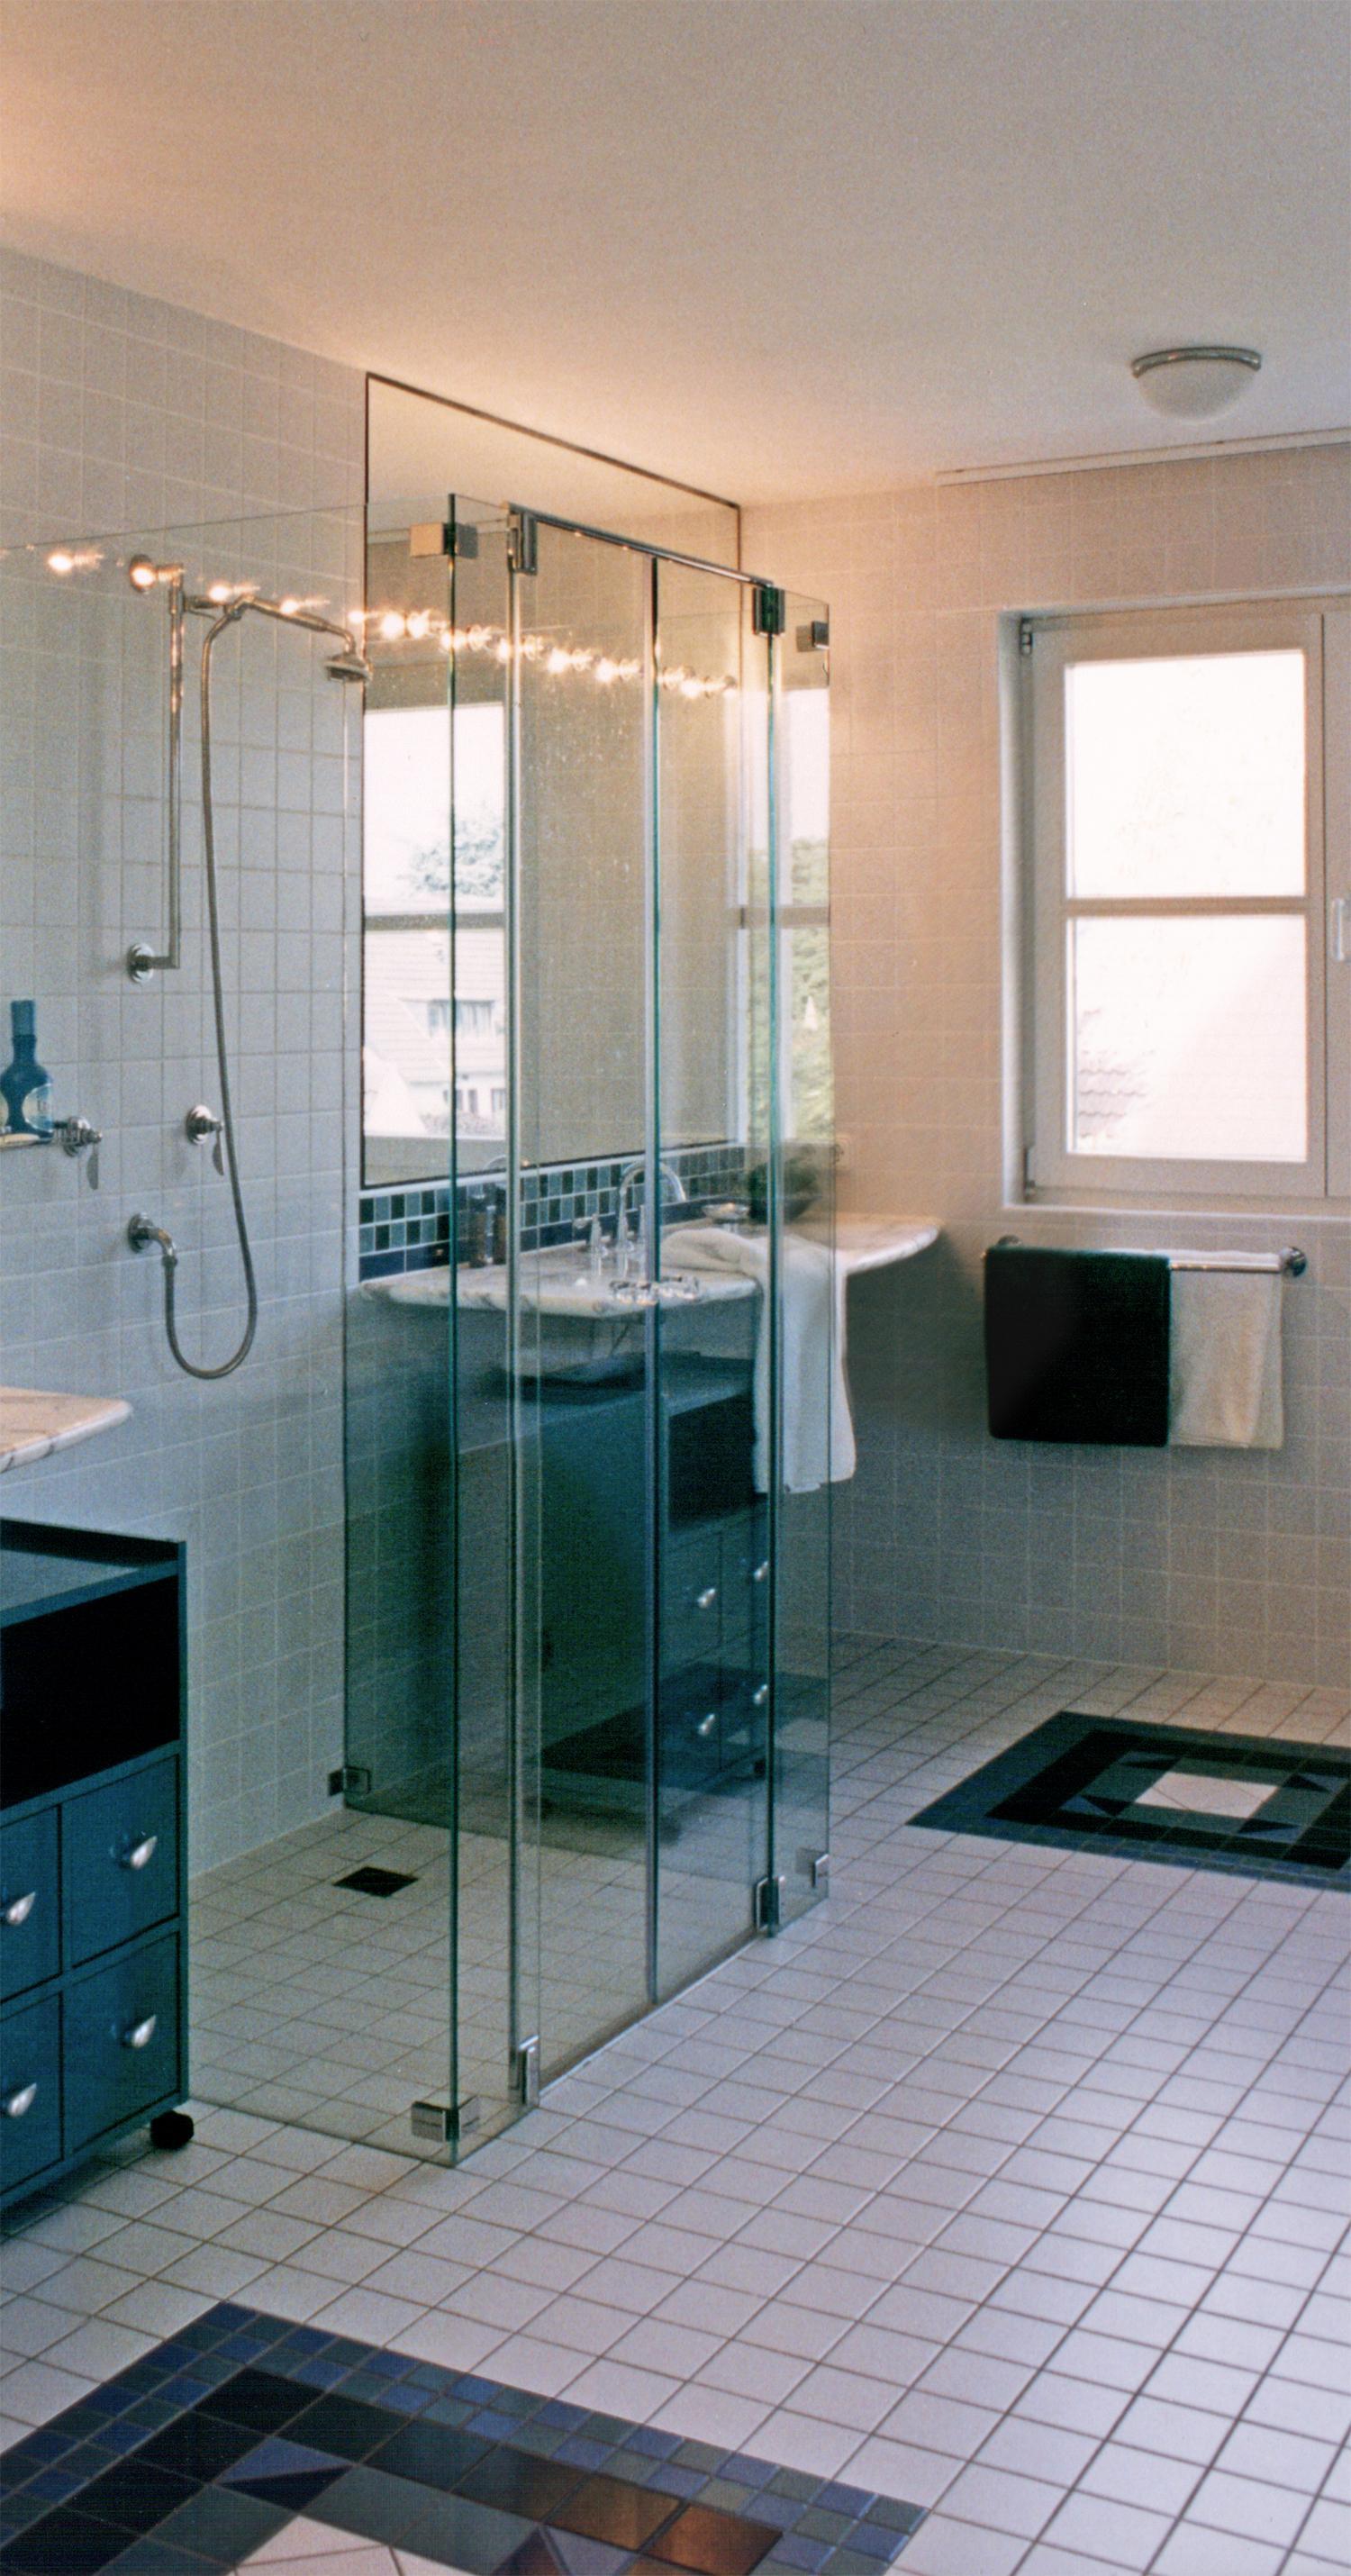 Fotowand Badezimmer | Glaserne Fotowand Bilder Ideen Couch